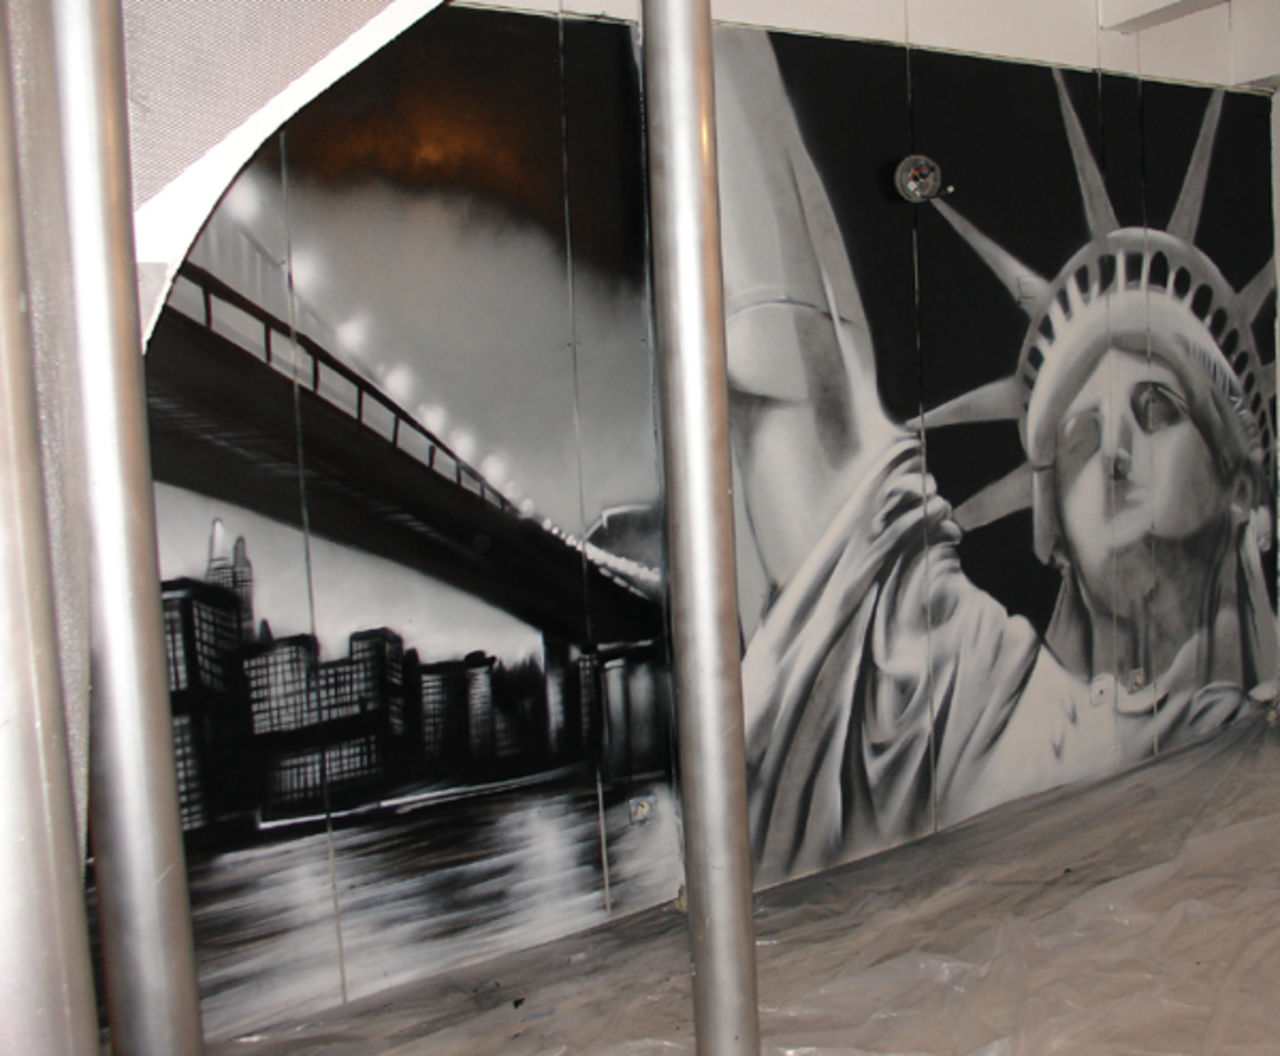 stiankr oner New York